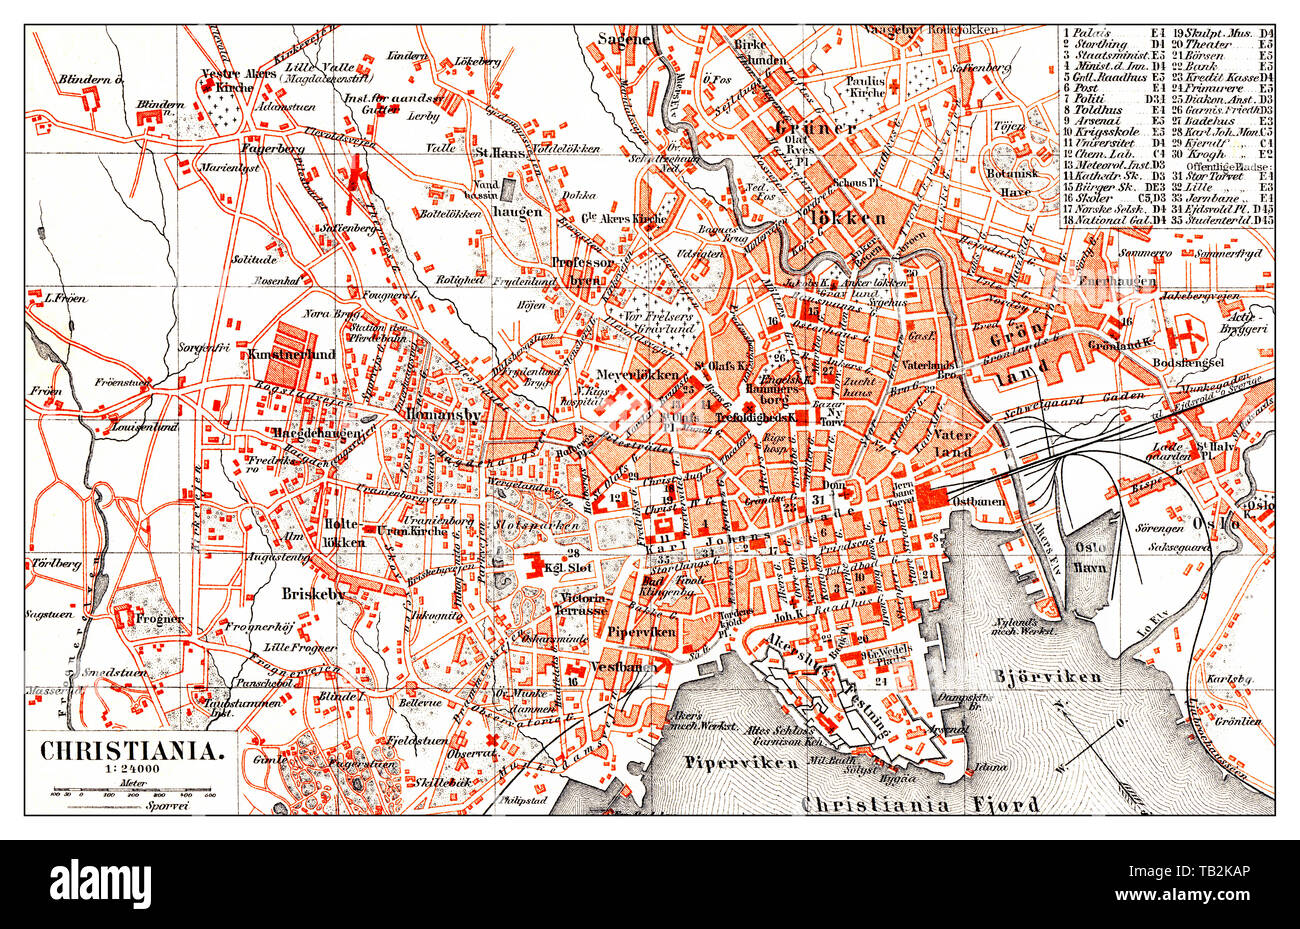 Dänemark Nordsee Karte.Dänemark Karte Stockfotos Dänemark Karte Bilder Alamy